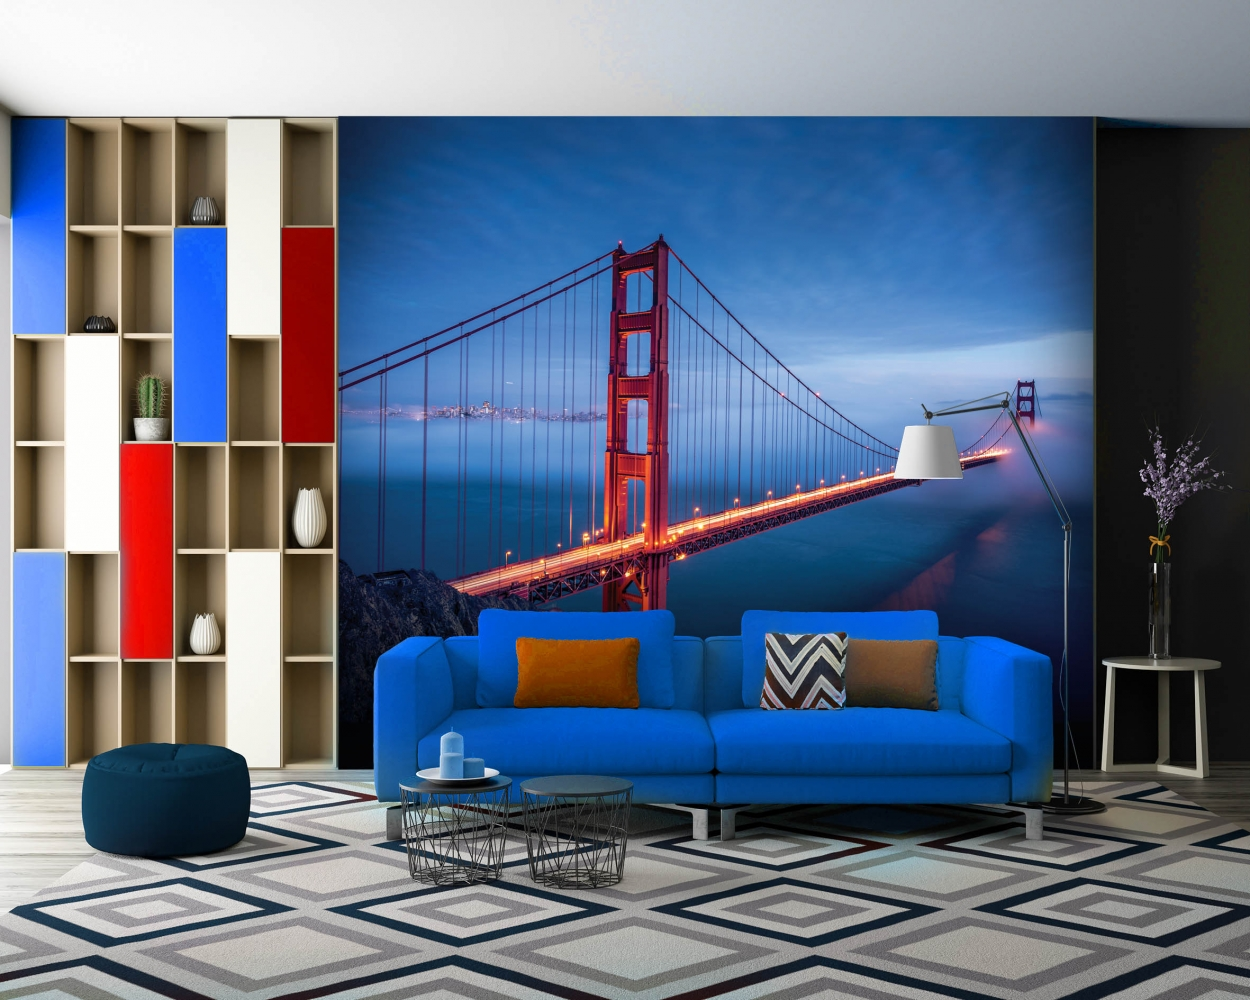 Tapeta Golden Gate Bridge, 432 x 290 cm